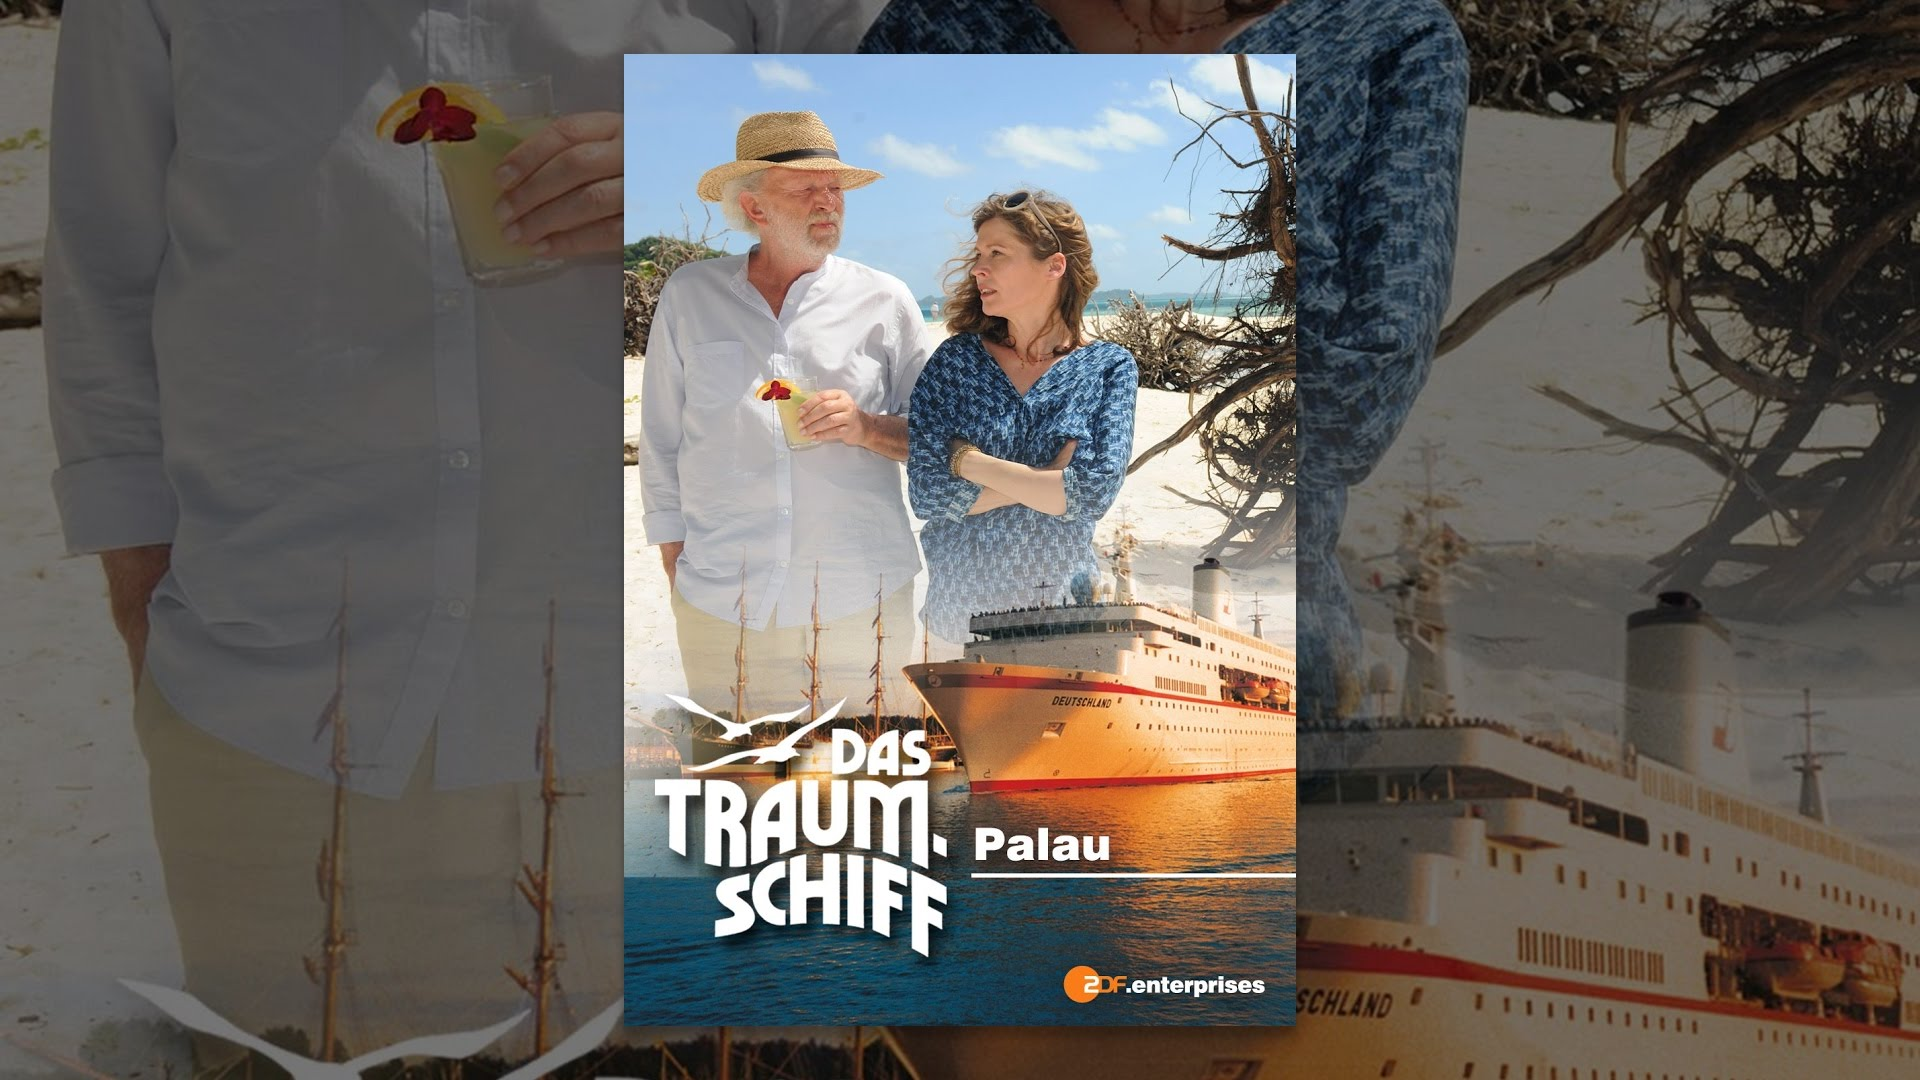 Das Traumschiff Palau